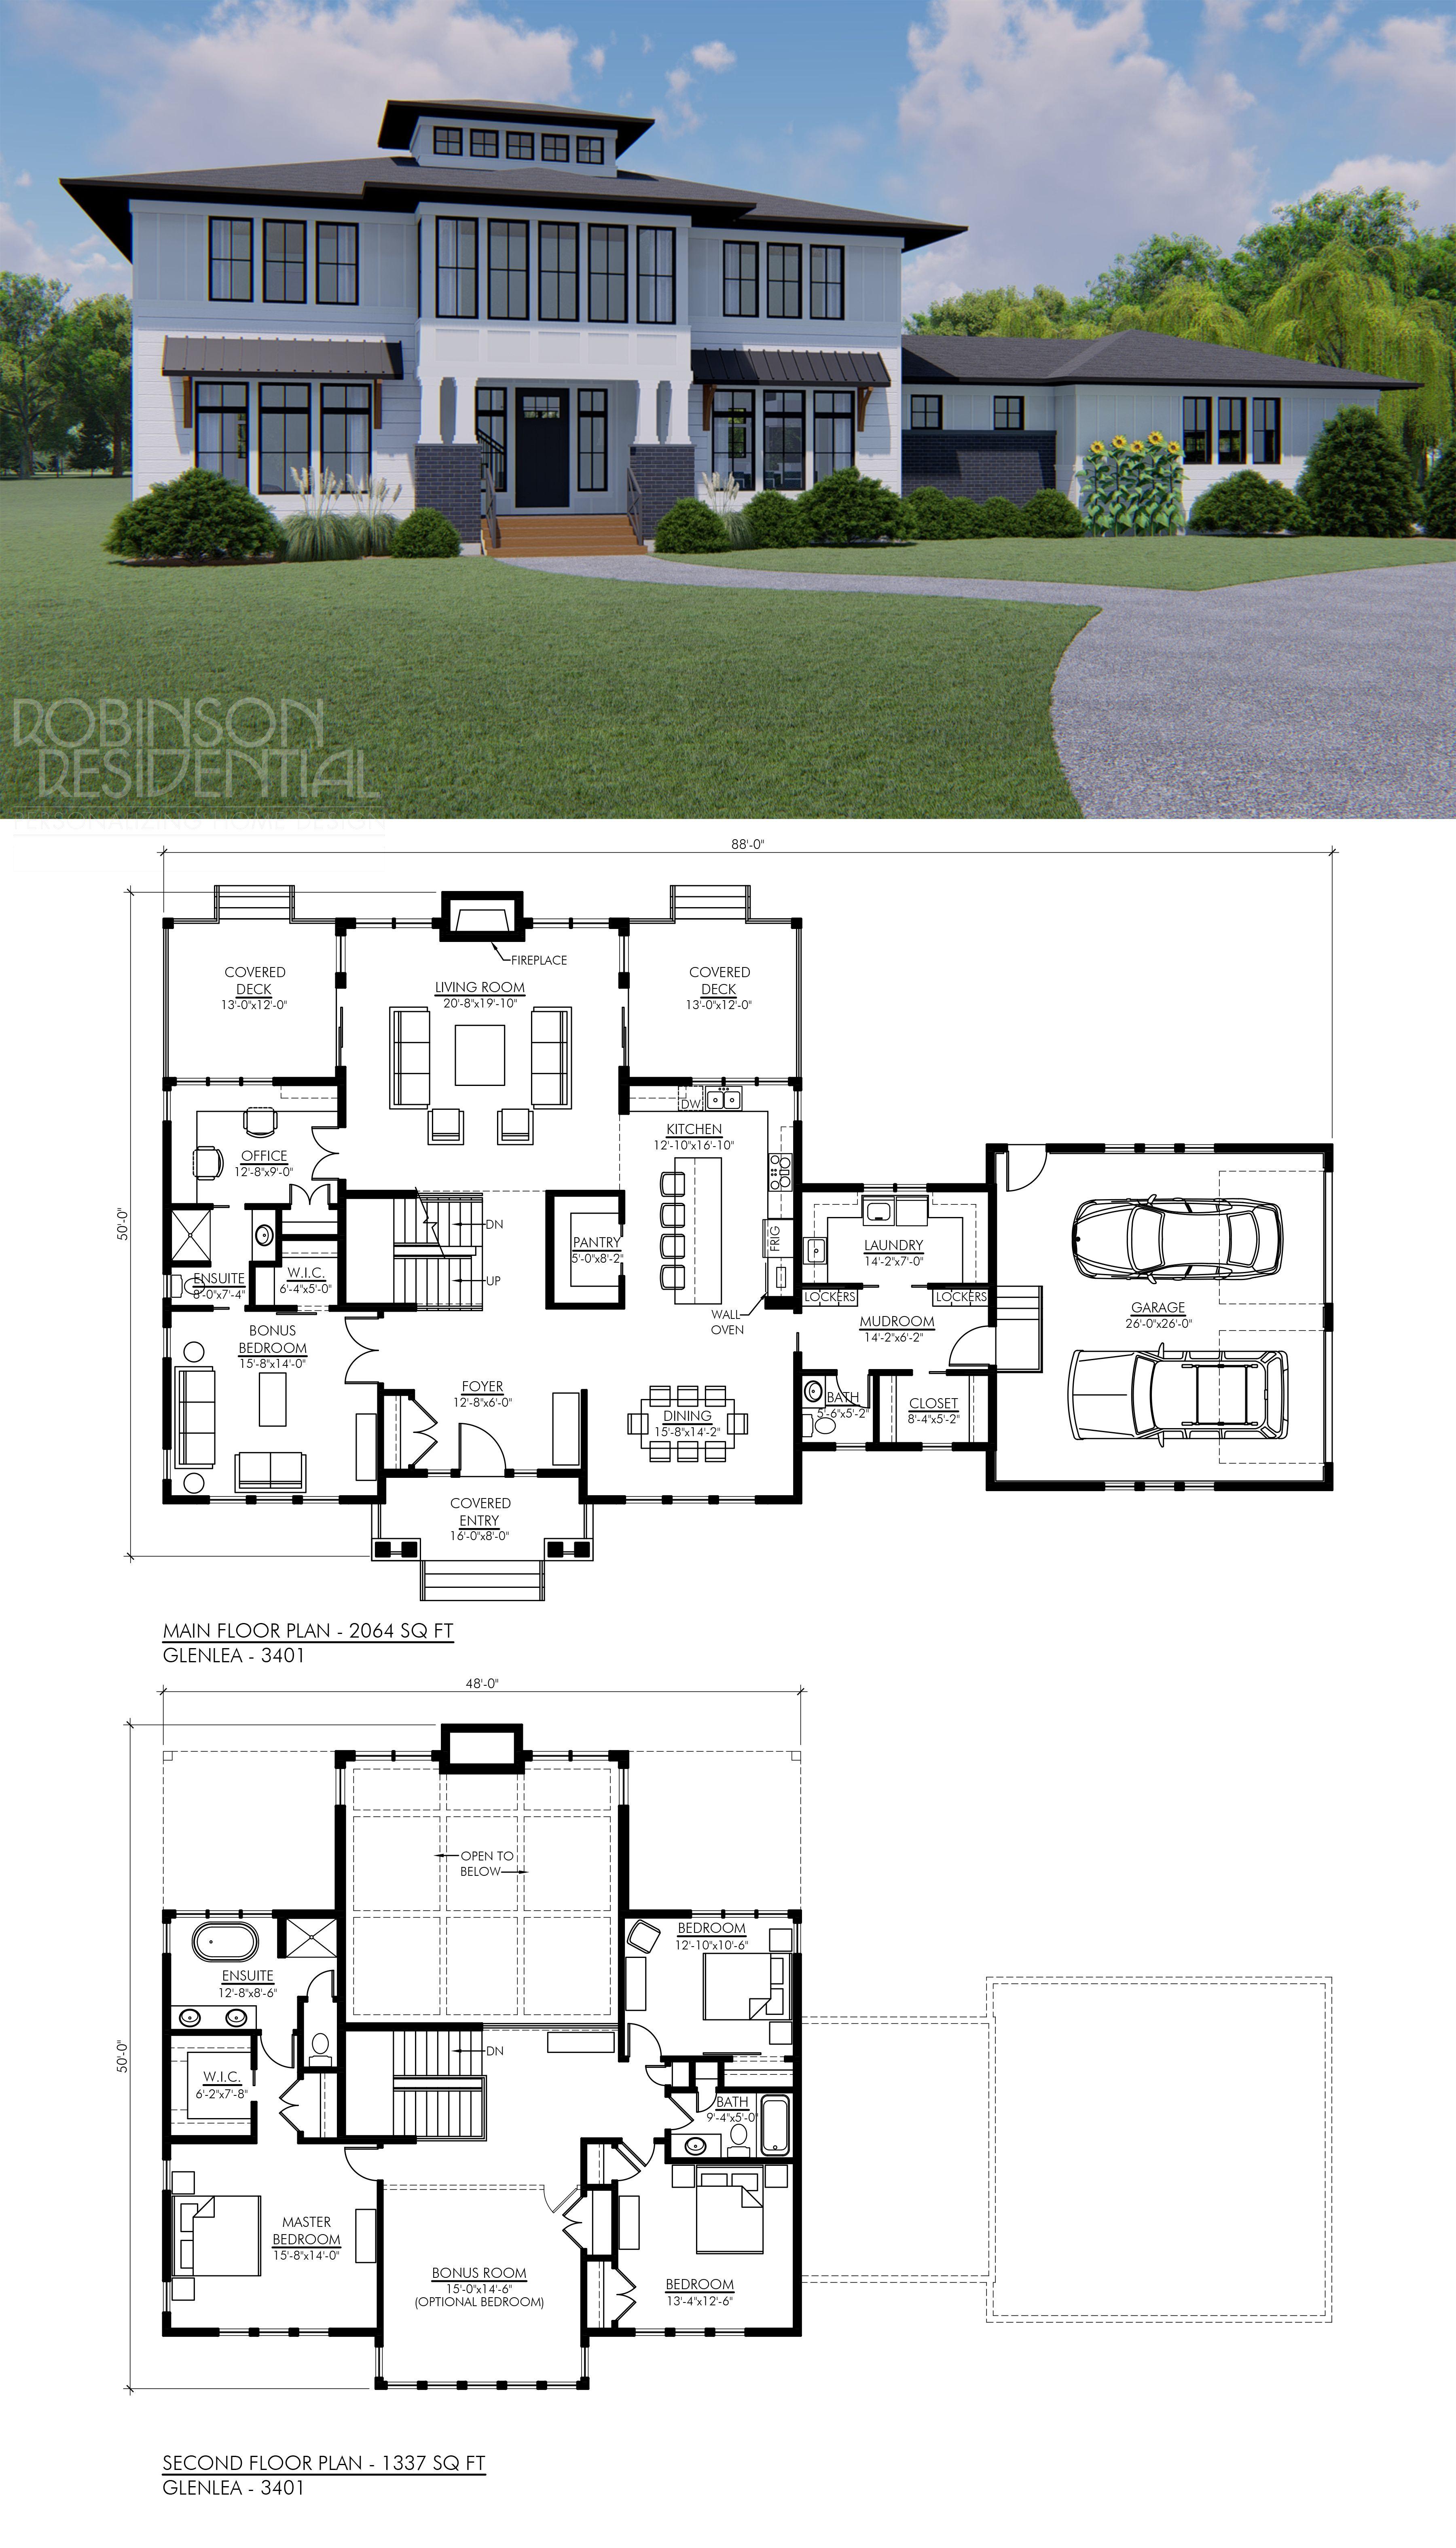 Modern Farmhouse Glenlea 3401